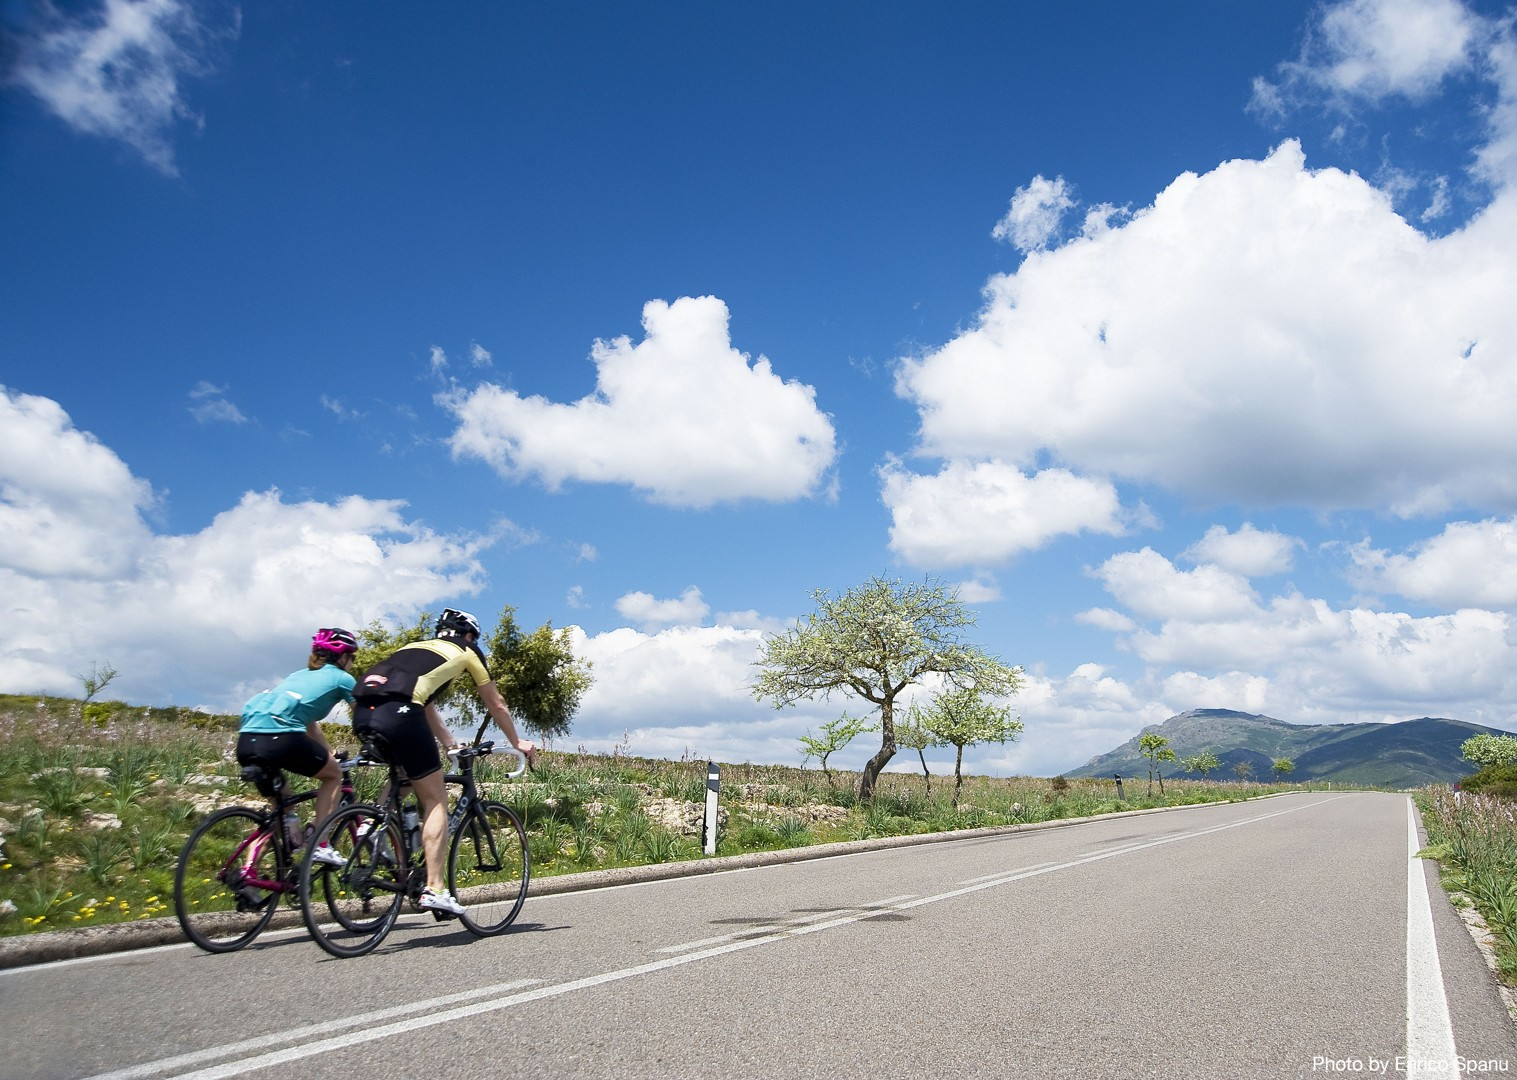 Road-Cycling-Holiday-Italy-Sardinia-Sardinian-Mountains-Flumendosa-Valley.jpg - Italy - Sardinia - Mountain Explorer - Guided Road Cycling Holiday - Italia Road Cycling